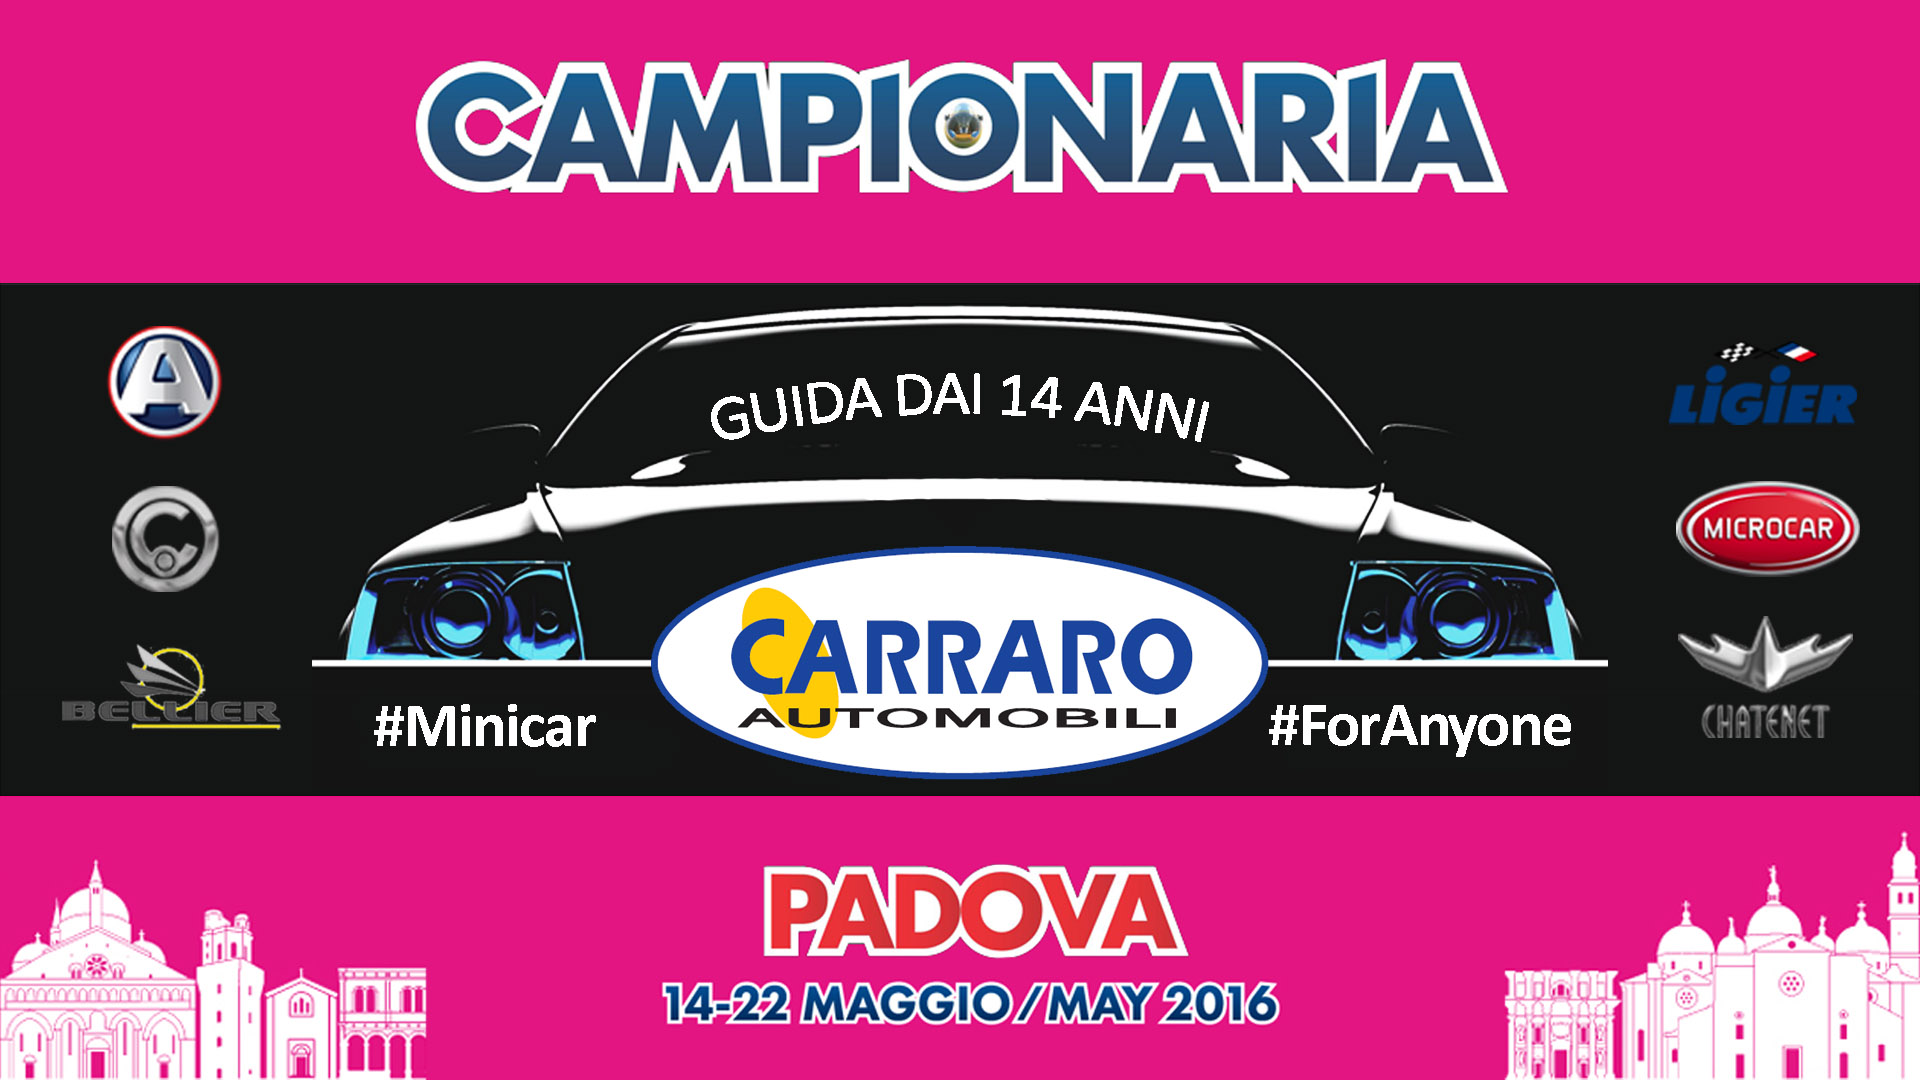 Fiera Campionaria di Padova - Ed. 2016